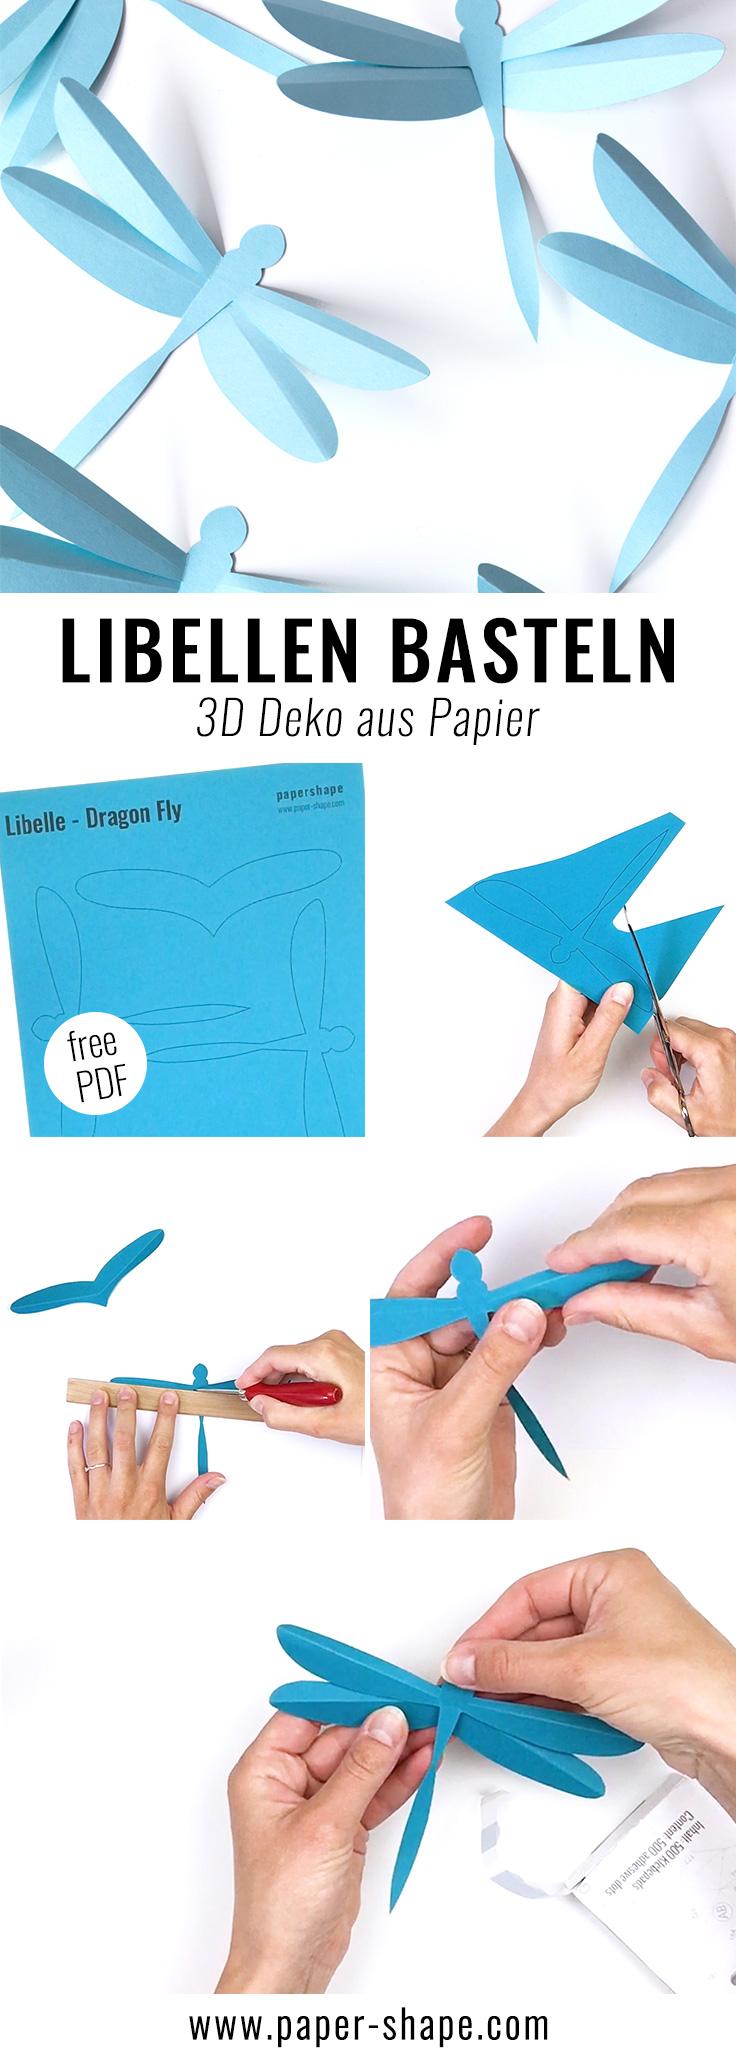 Beste Häkeln Libelle Muster Galerie - Strickmuster-Ideen ...